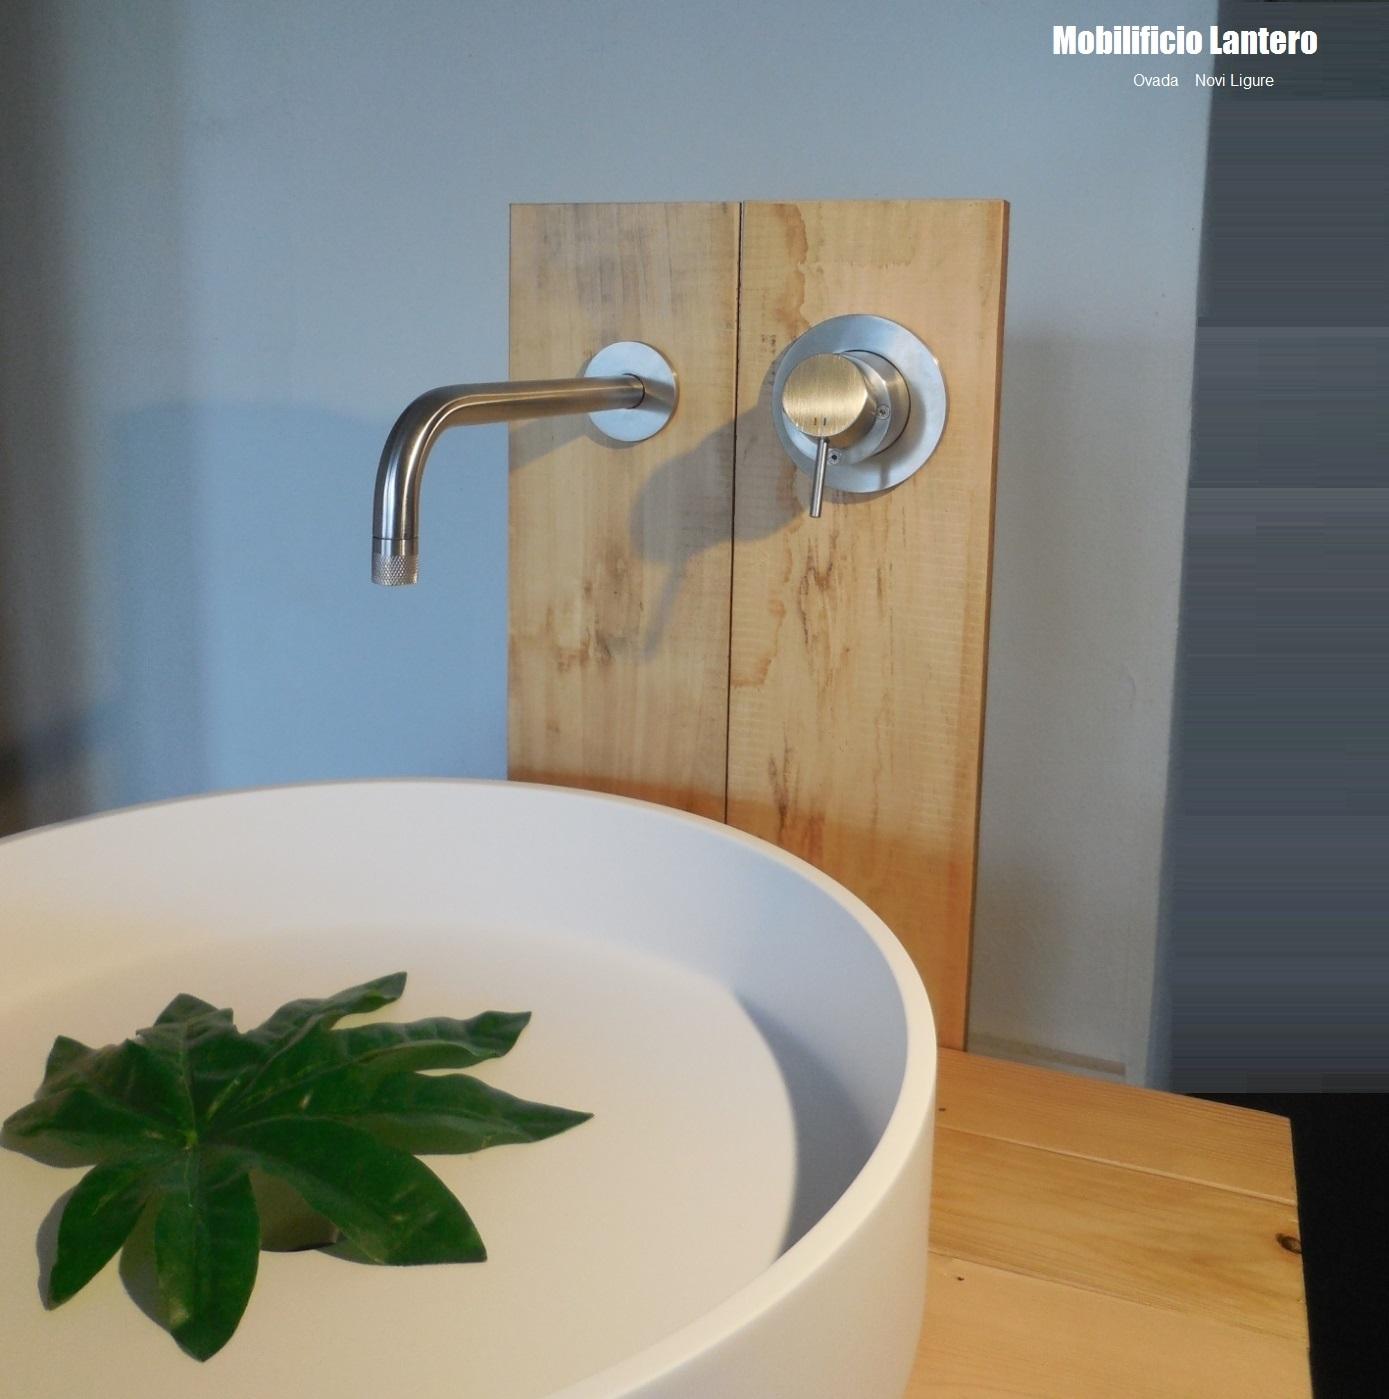 boffi boffi, lotus lavabo con miscelatore minimal design - arredo ... - Arredo Bagno Ovada